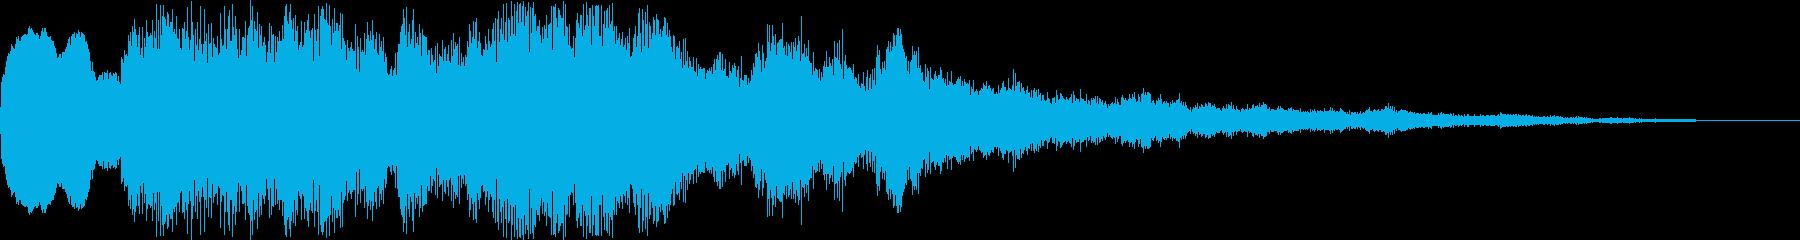 Japanese Sakura_Congratulations / Thank you, Congratulations's reproduced waveform